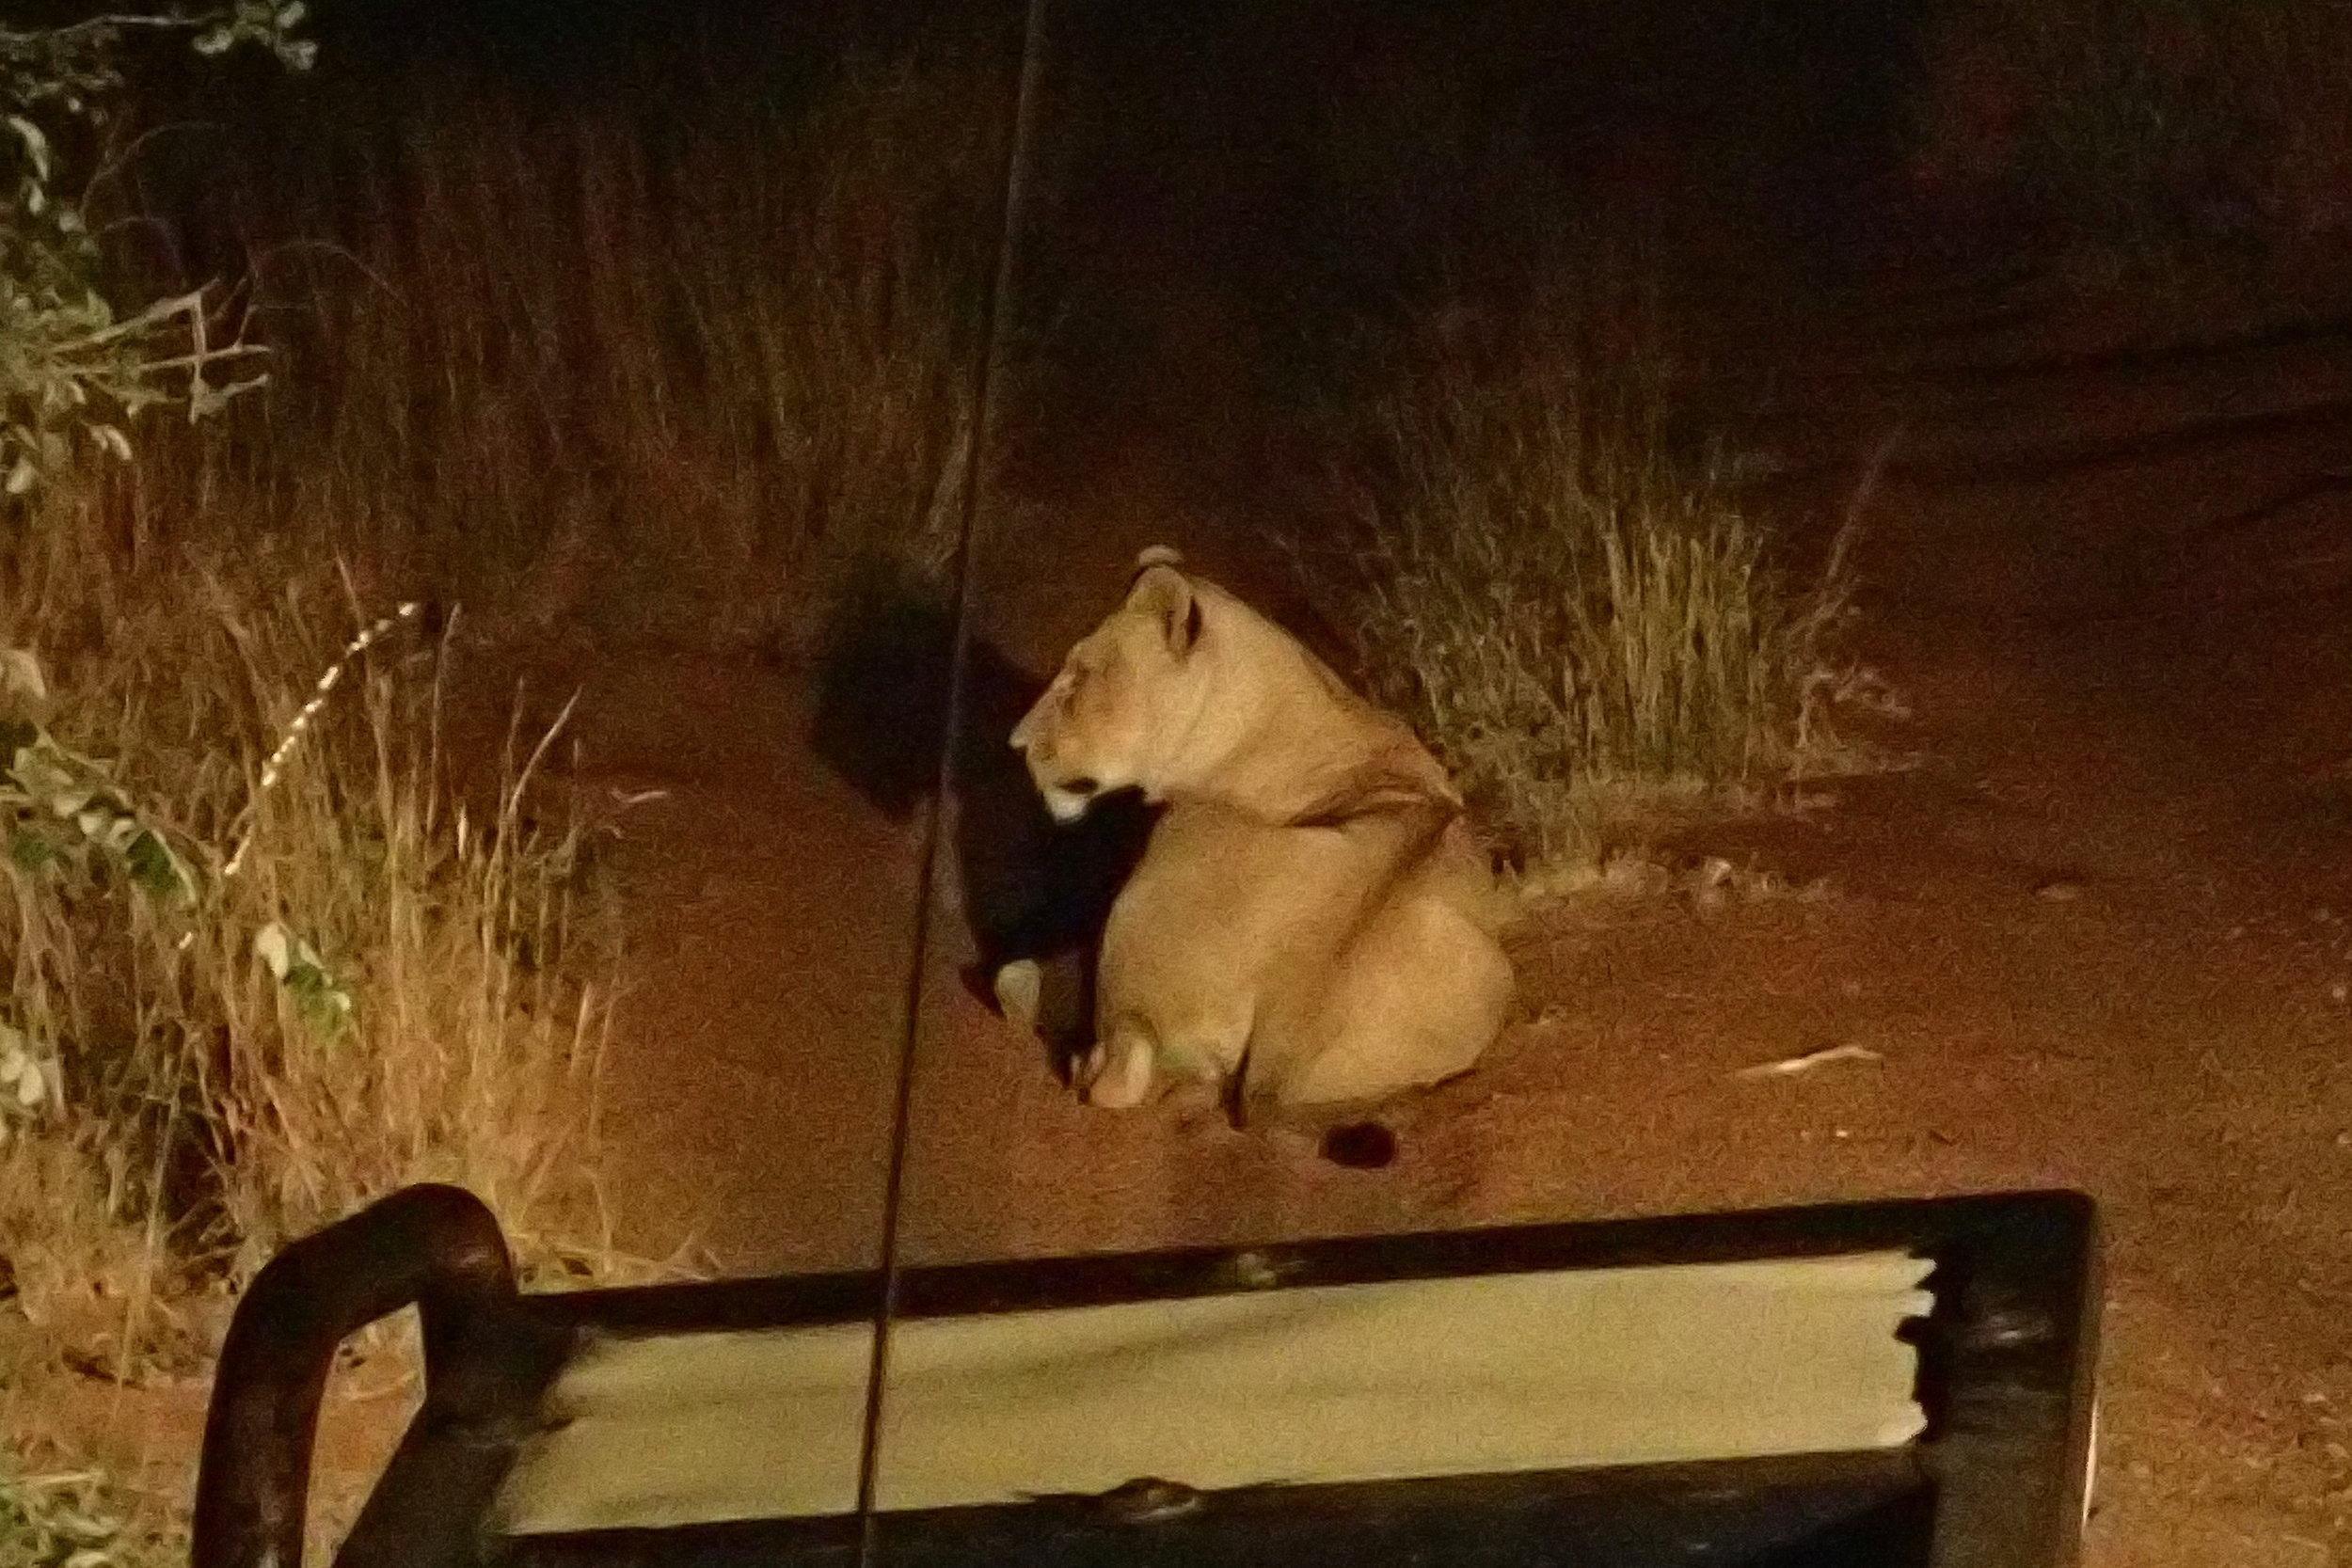 Heyyyy Nala! Where's Simba?